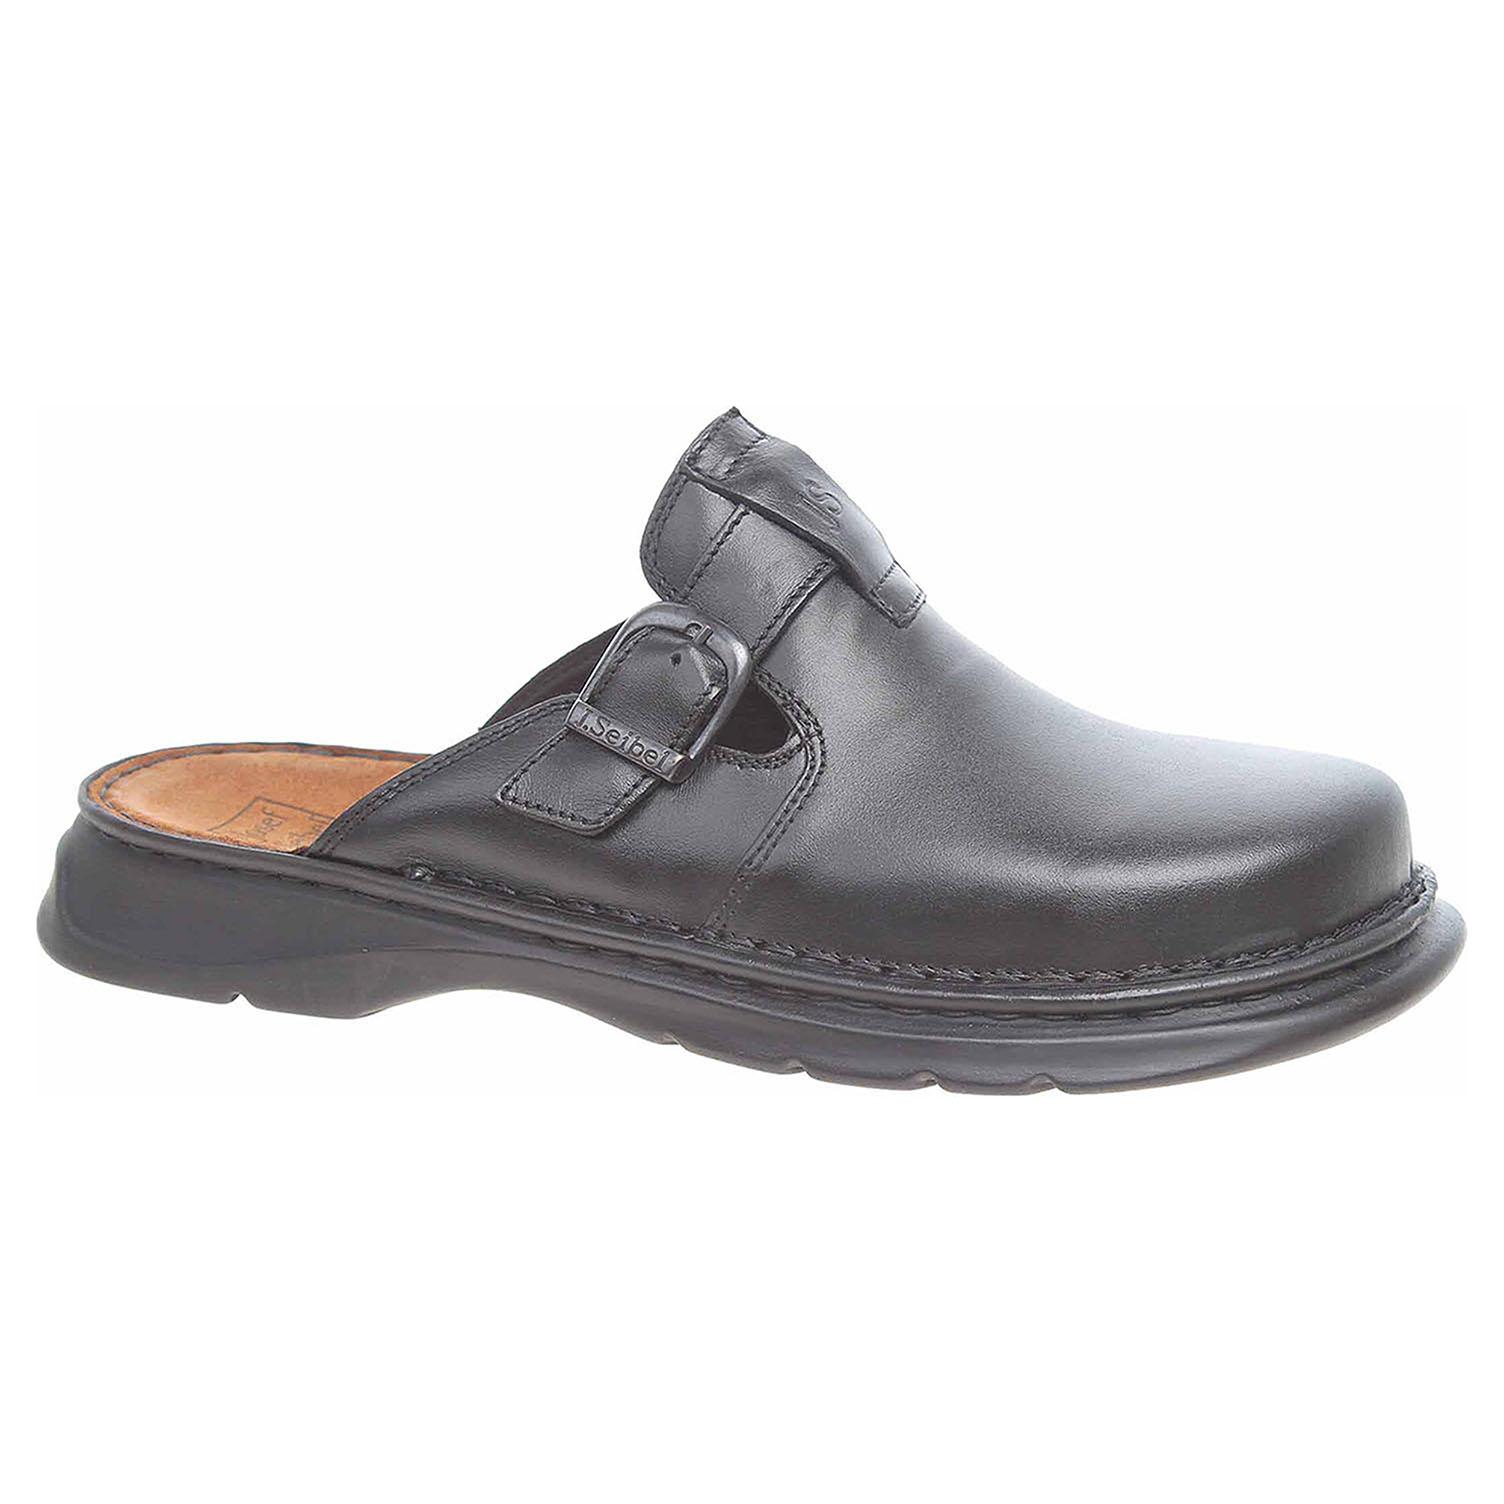 Pánské pantofle Josef Seibel 45905 23100 schwarz 45905 23100 50